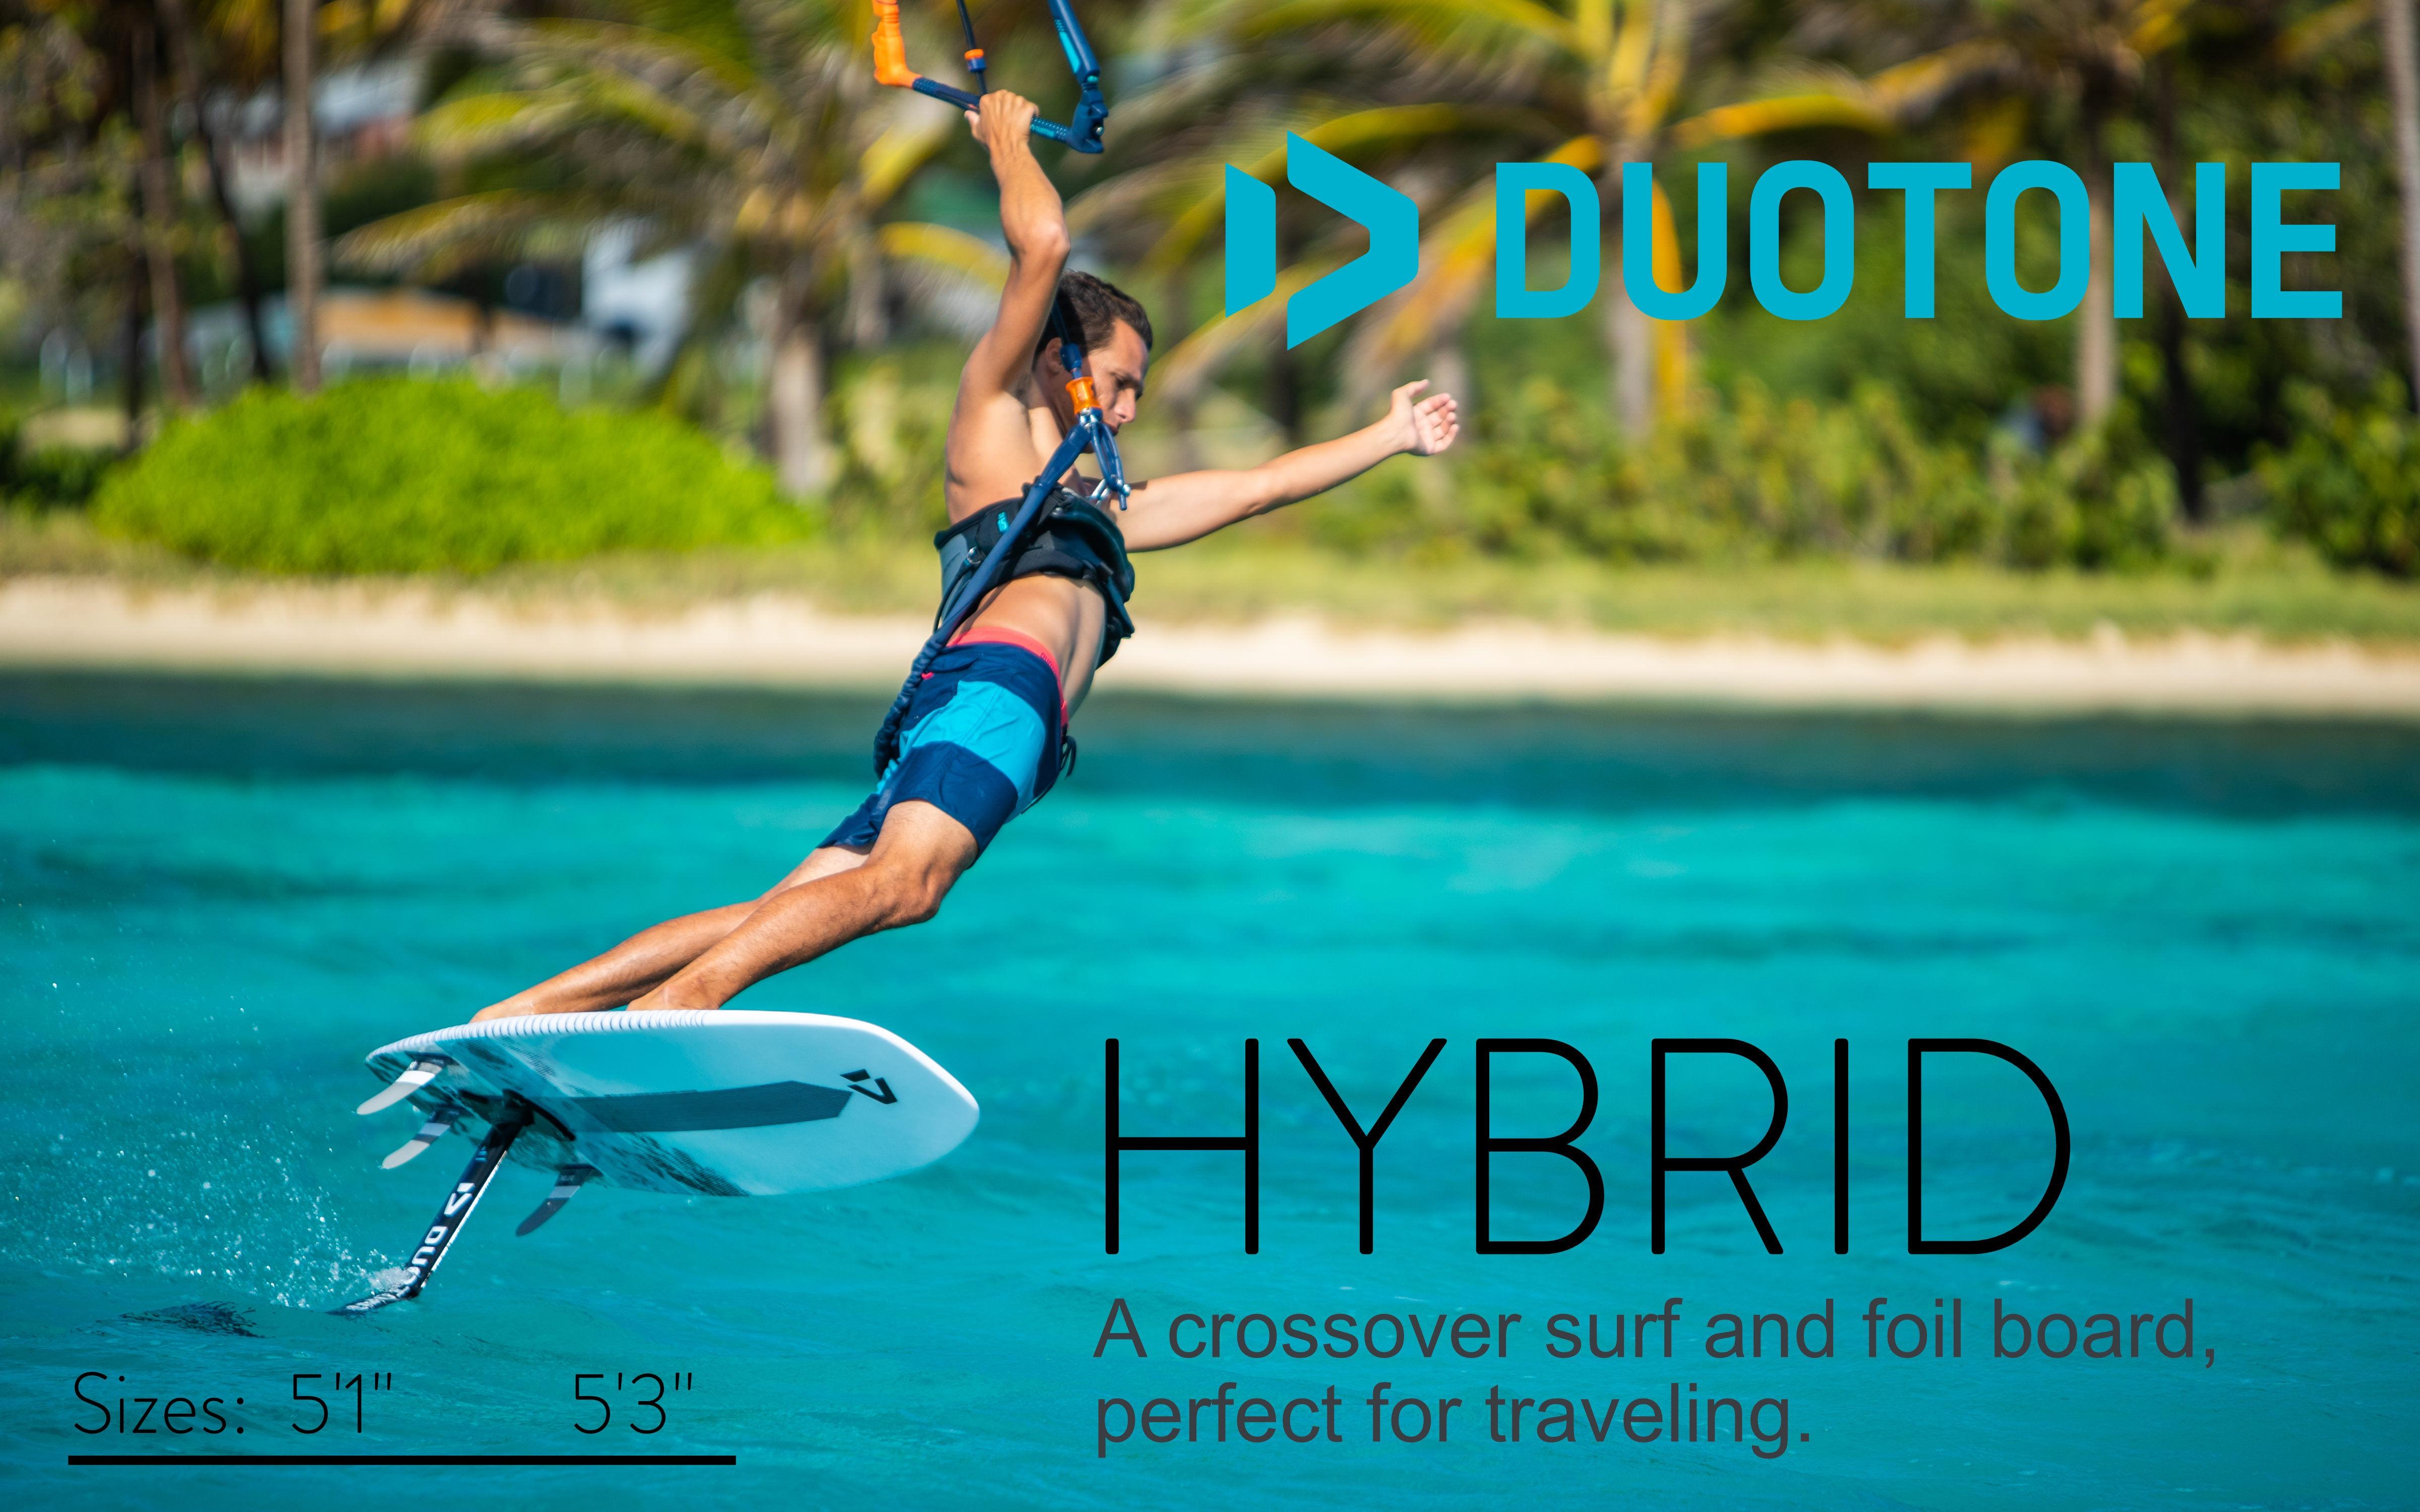 Titel-HYBRID-FOIL